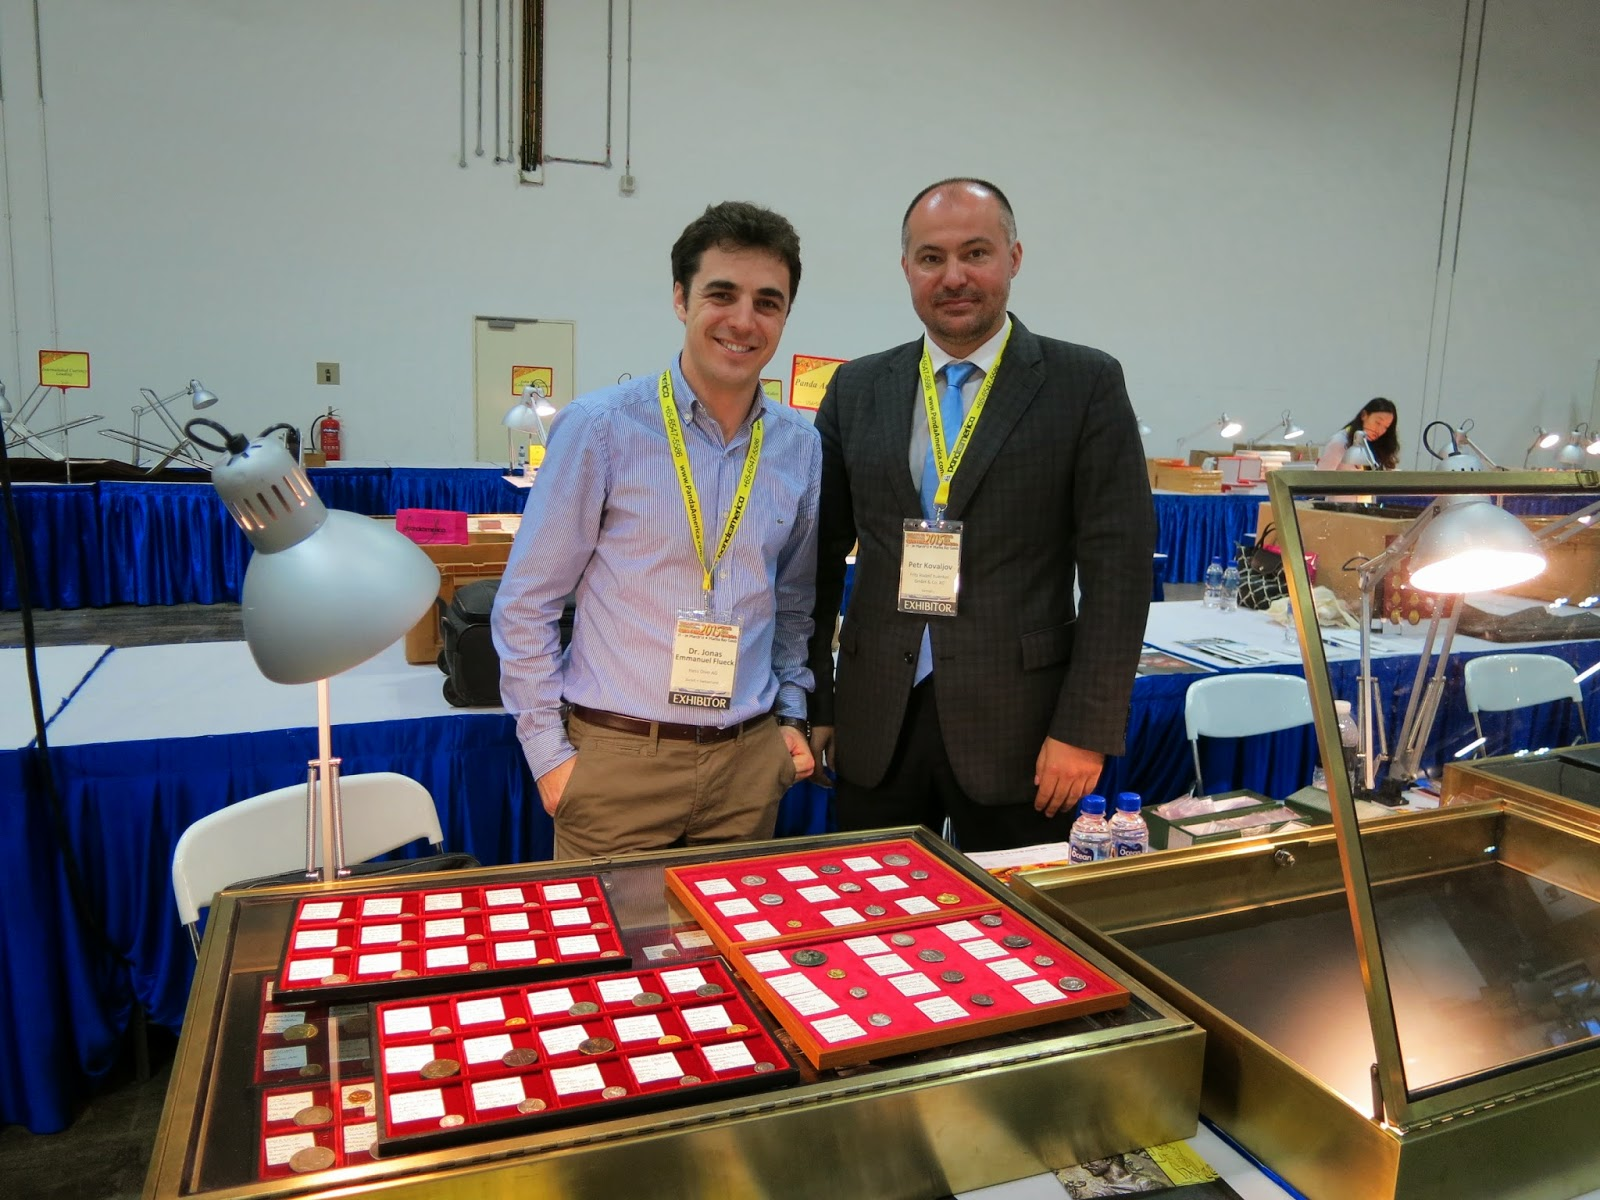 Dr. Jonas, Petr Kovaljov from Kunker, Switzerland